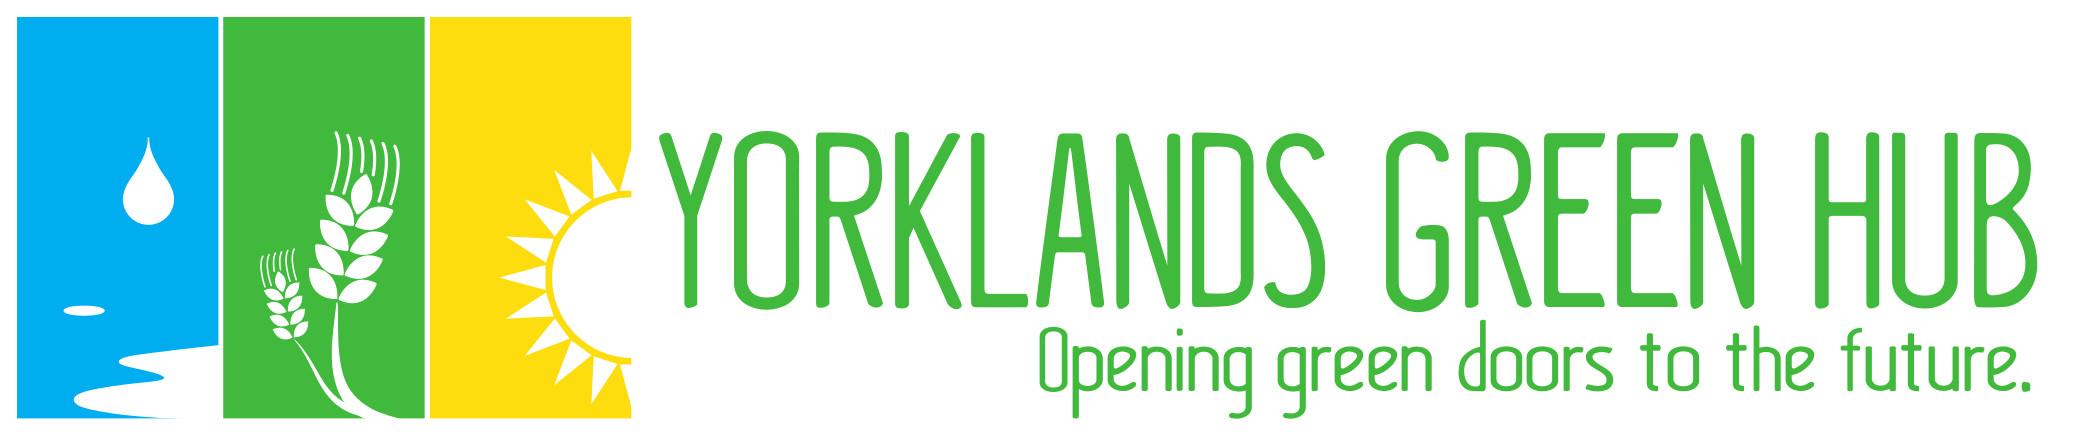 Yorklands Green Hub logo